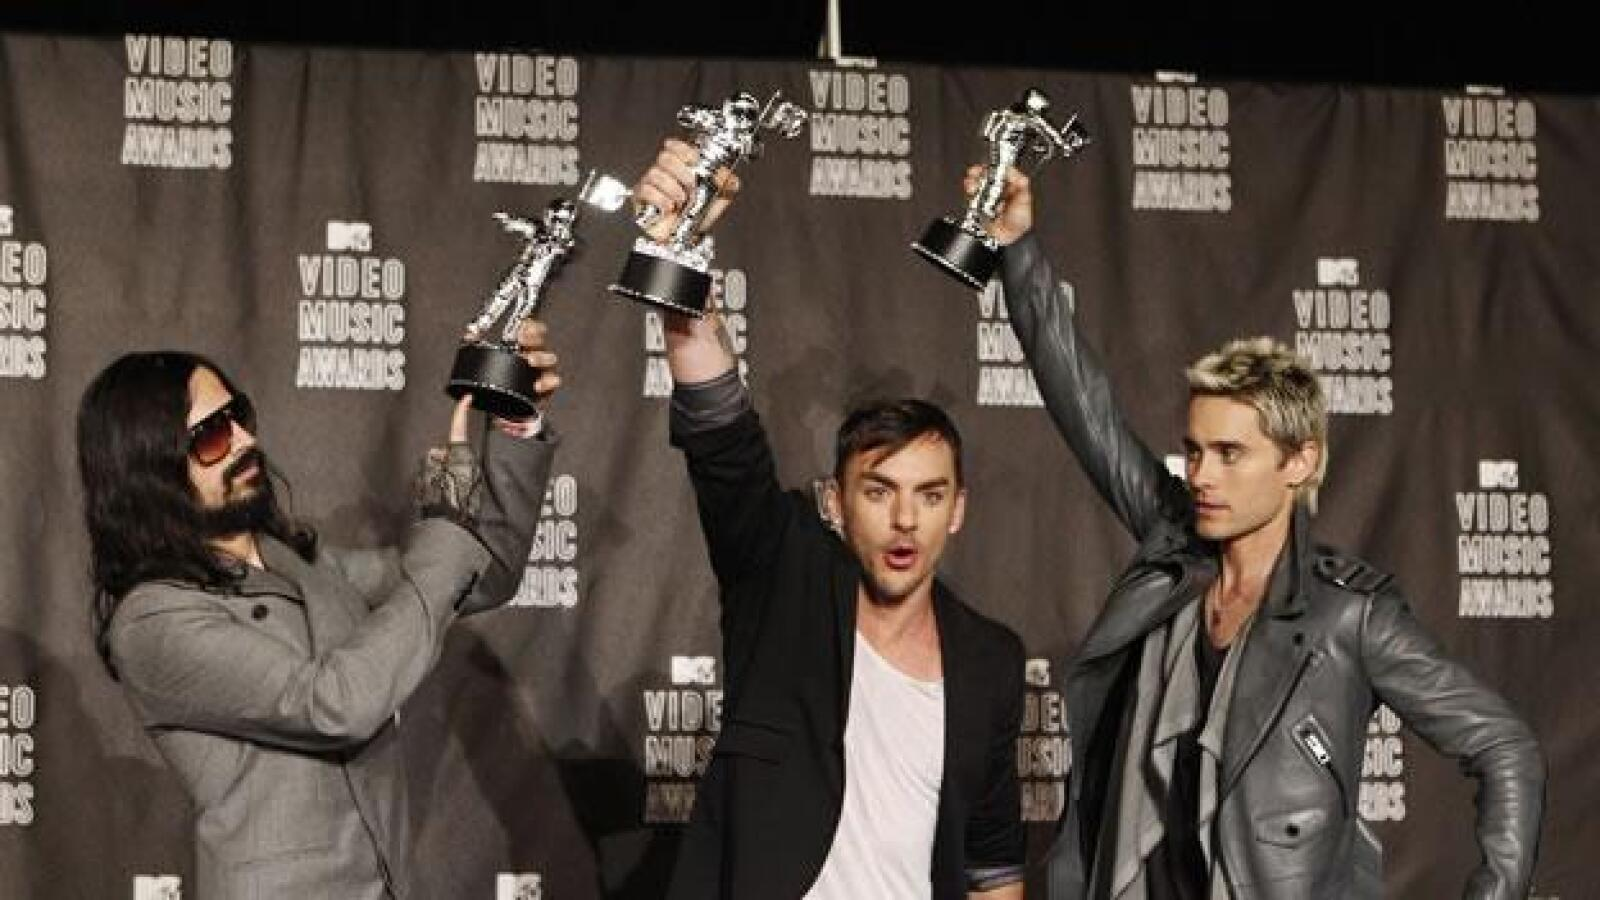 30 seconds to mars MTV 2010